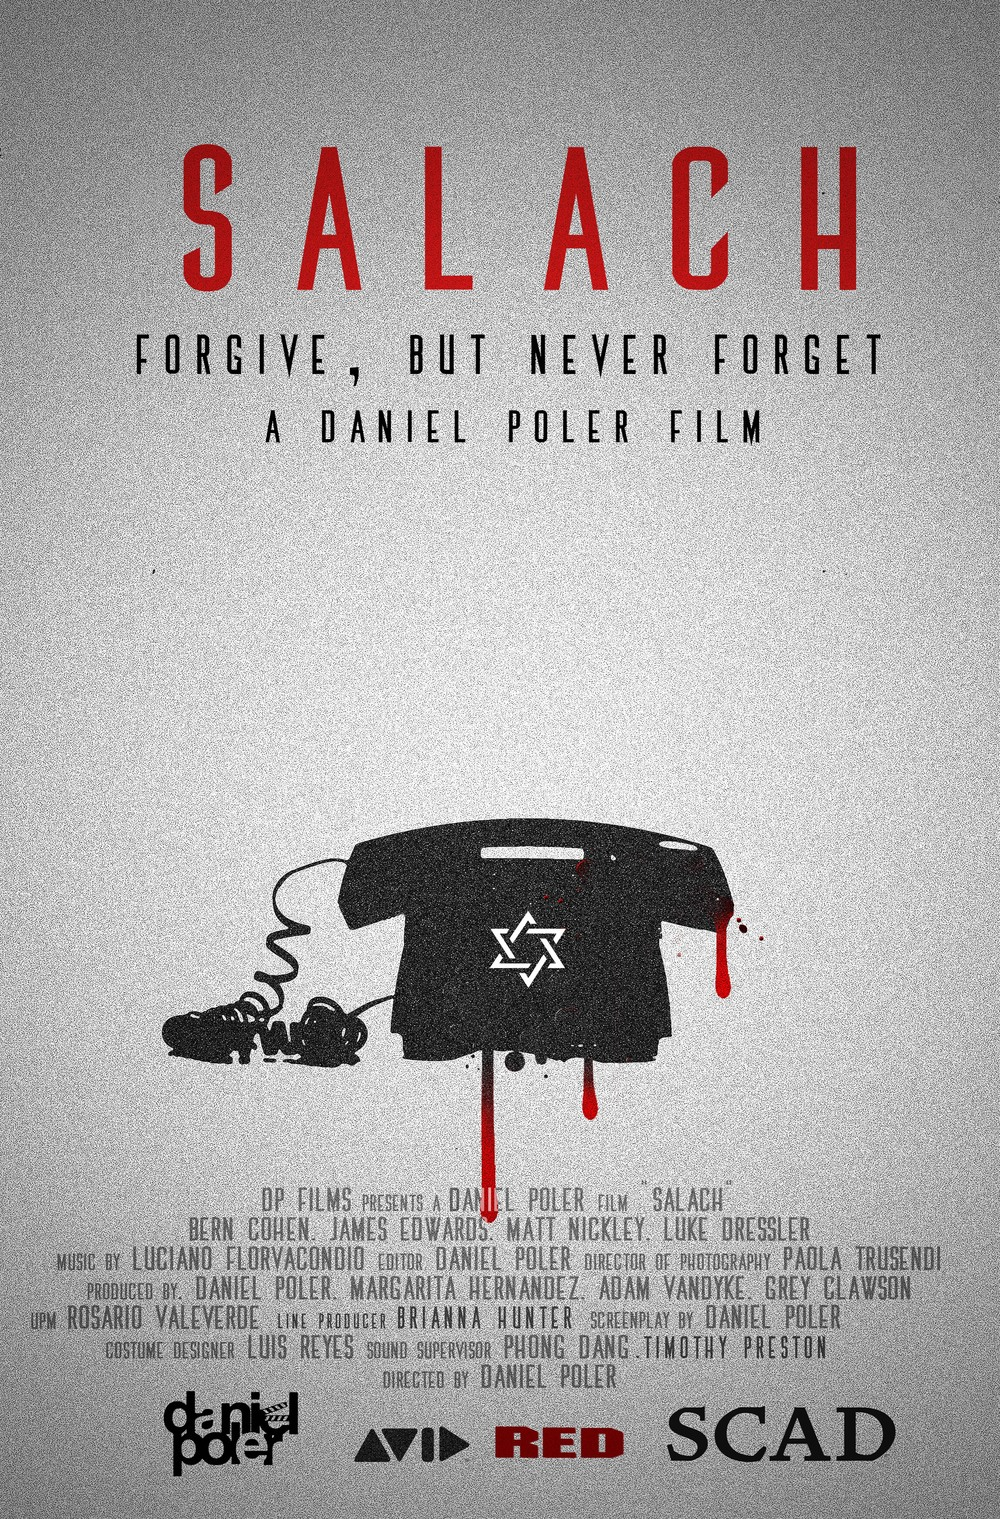 Salach poster design by Daniel Poler.